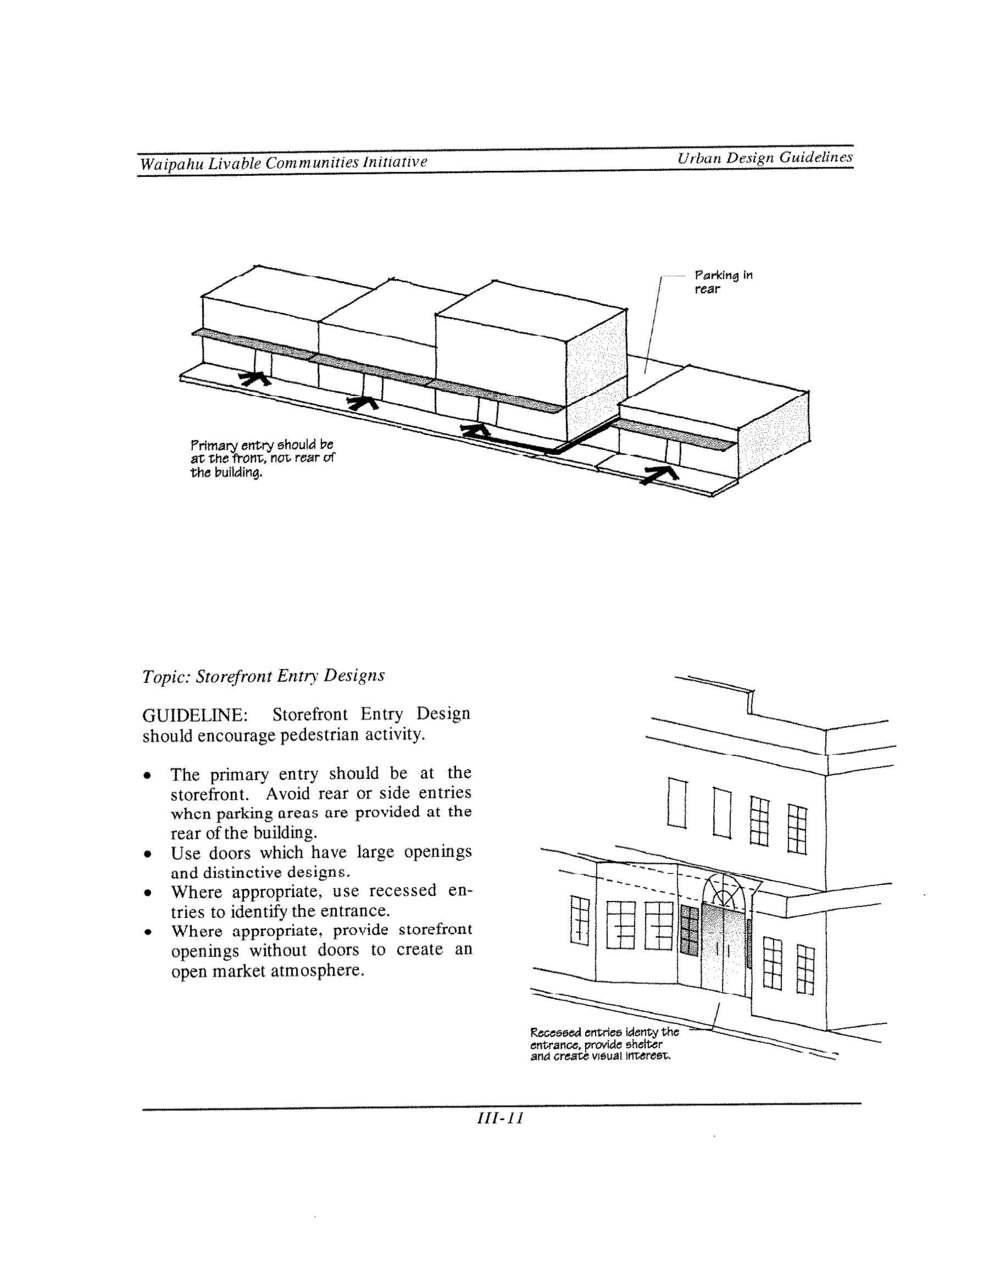 160531_WaipahuLivableCommunities(1998)_Page_101.jpg